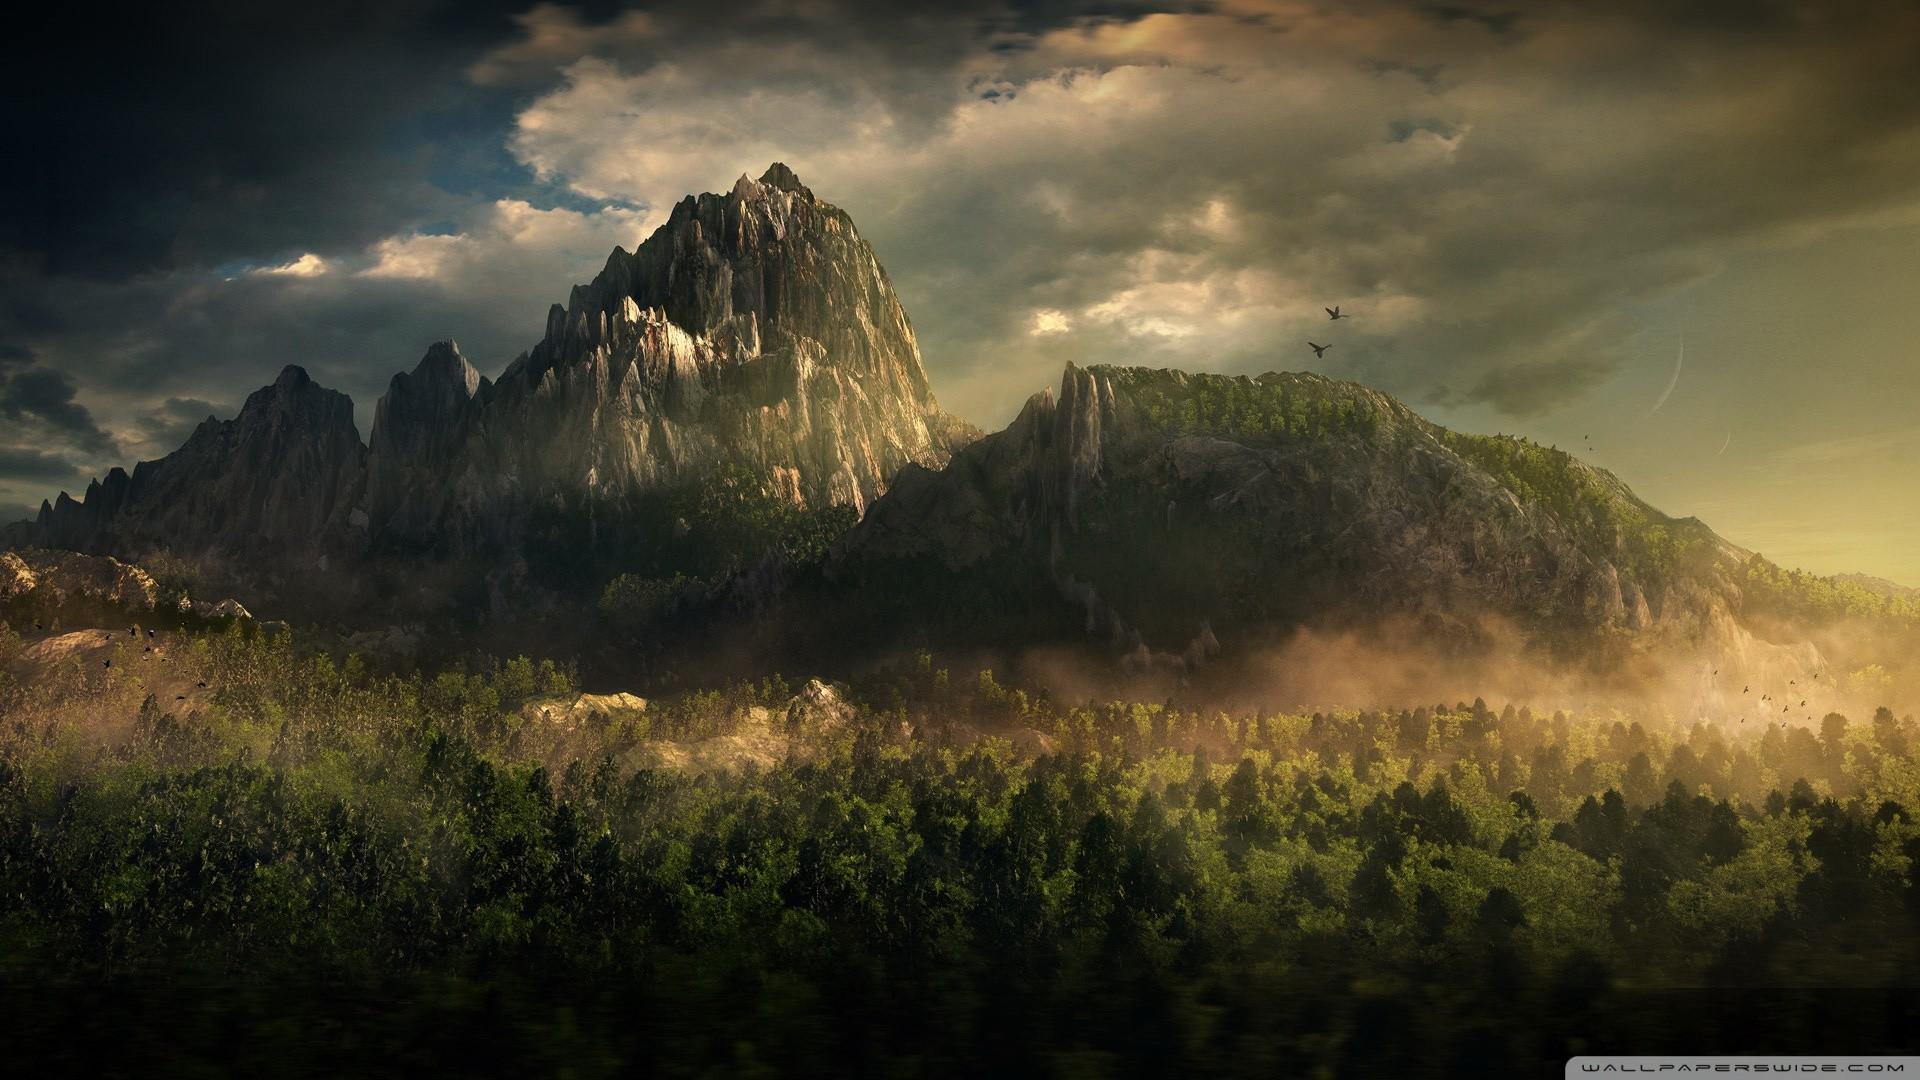 4K Ultra HD Incredible Landscape Pics HD Wallpapers